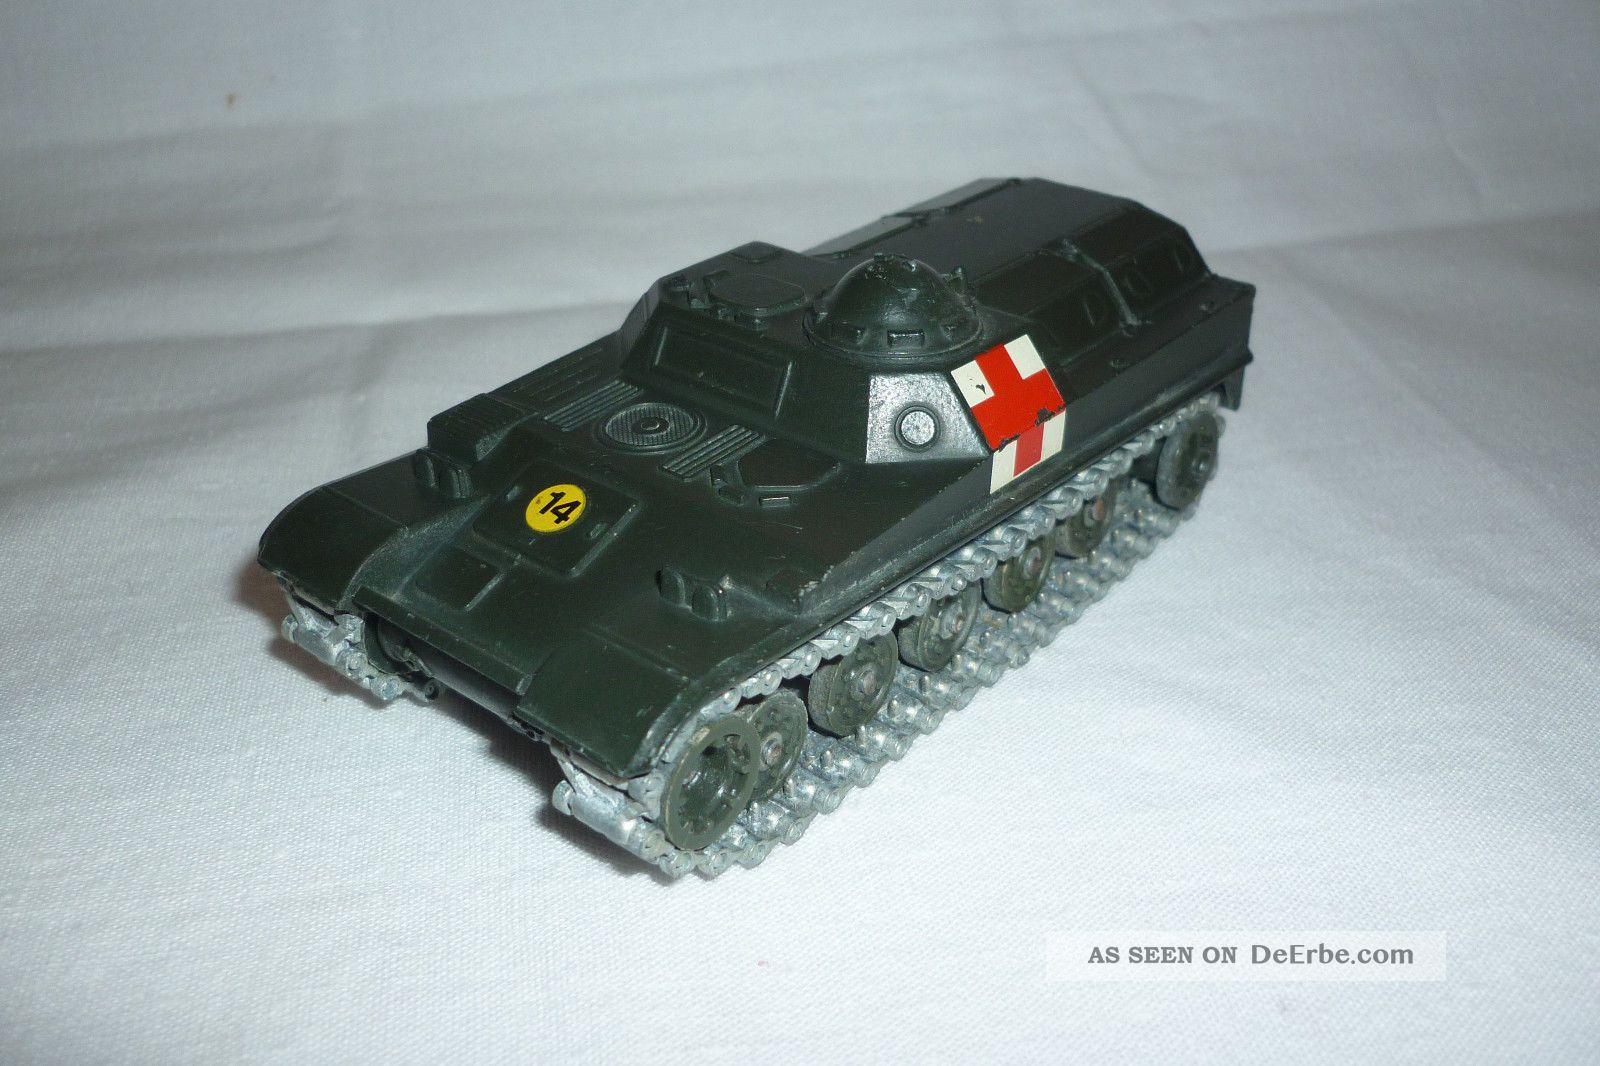 Solido - Metallmodell - Panzer / Tank - Amx - 13t V C I - 1:50 - (4.  Bm - 59) Gefertigt nach 1970 Bild